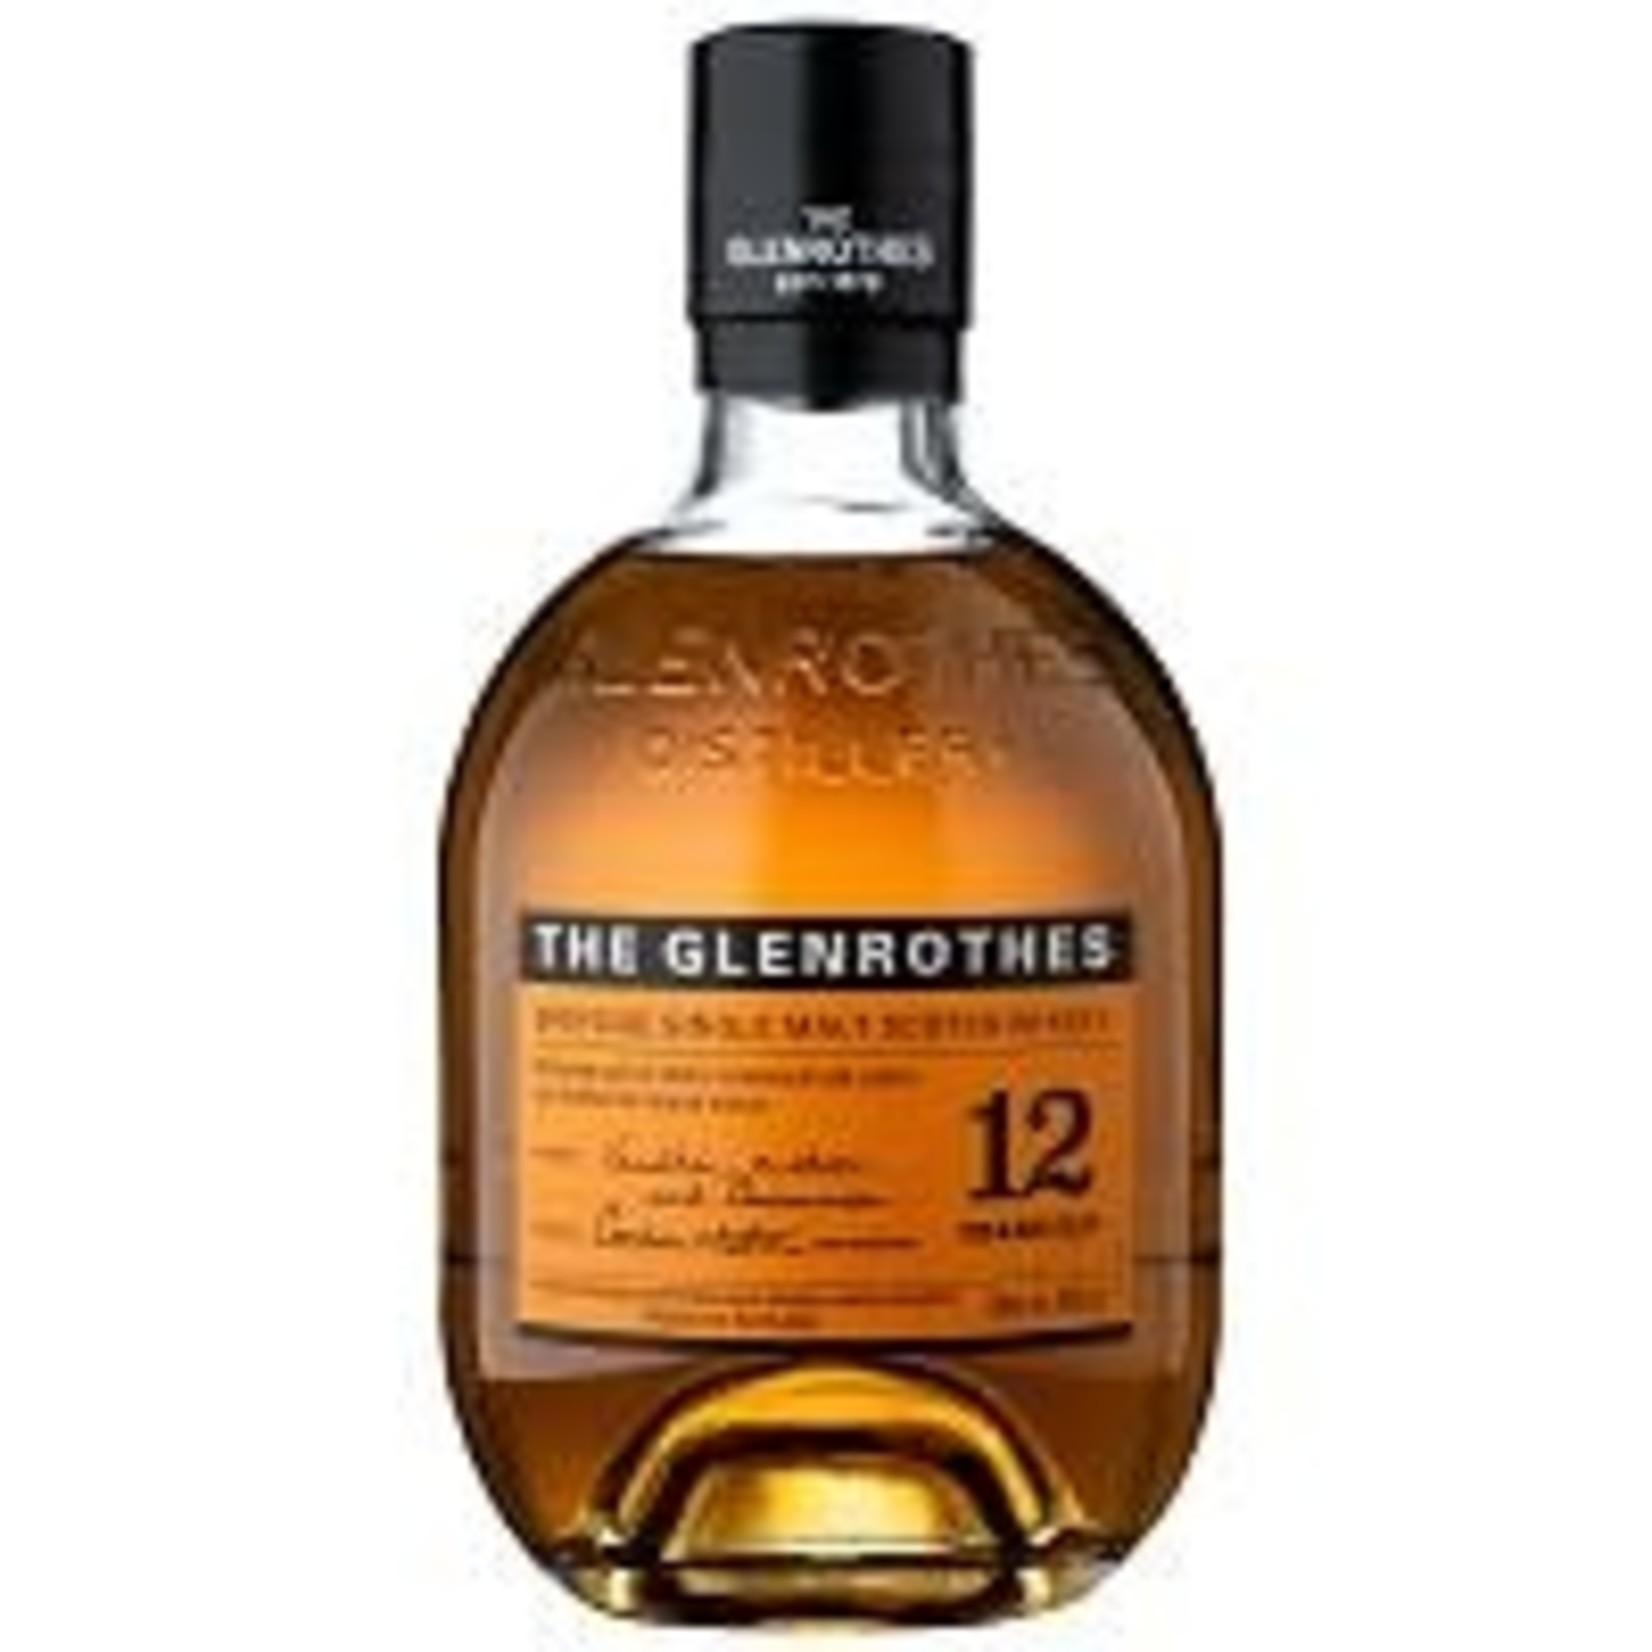 Spirits The Glenrothes Scotch Singe Malt 12 Year